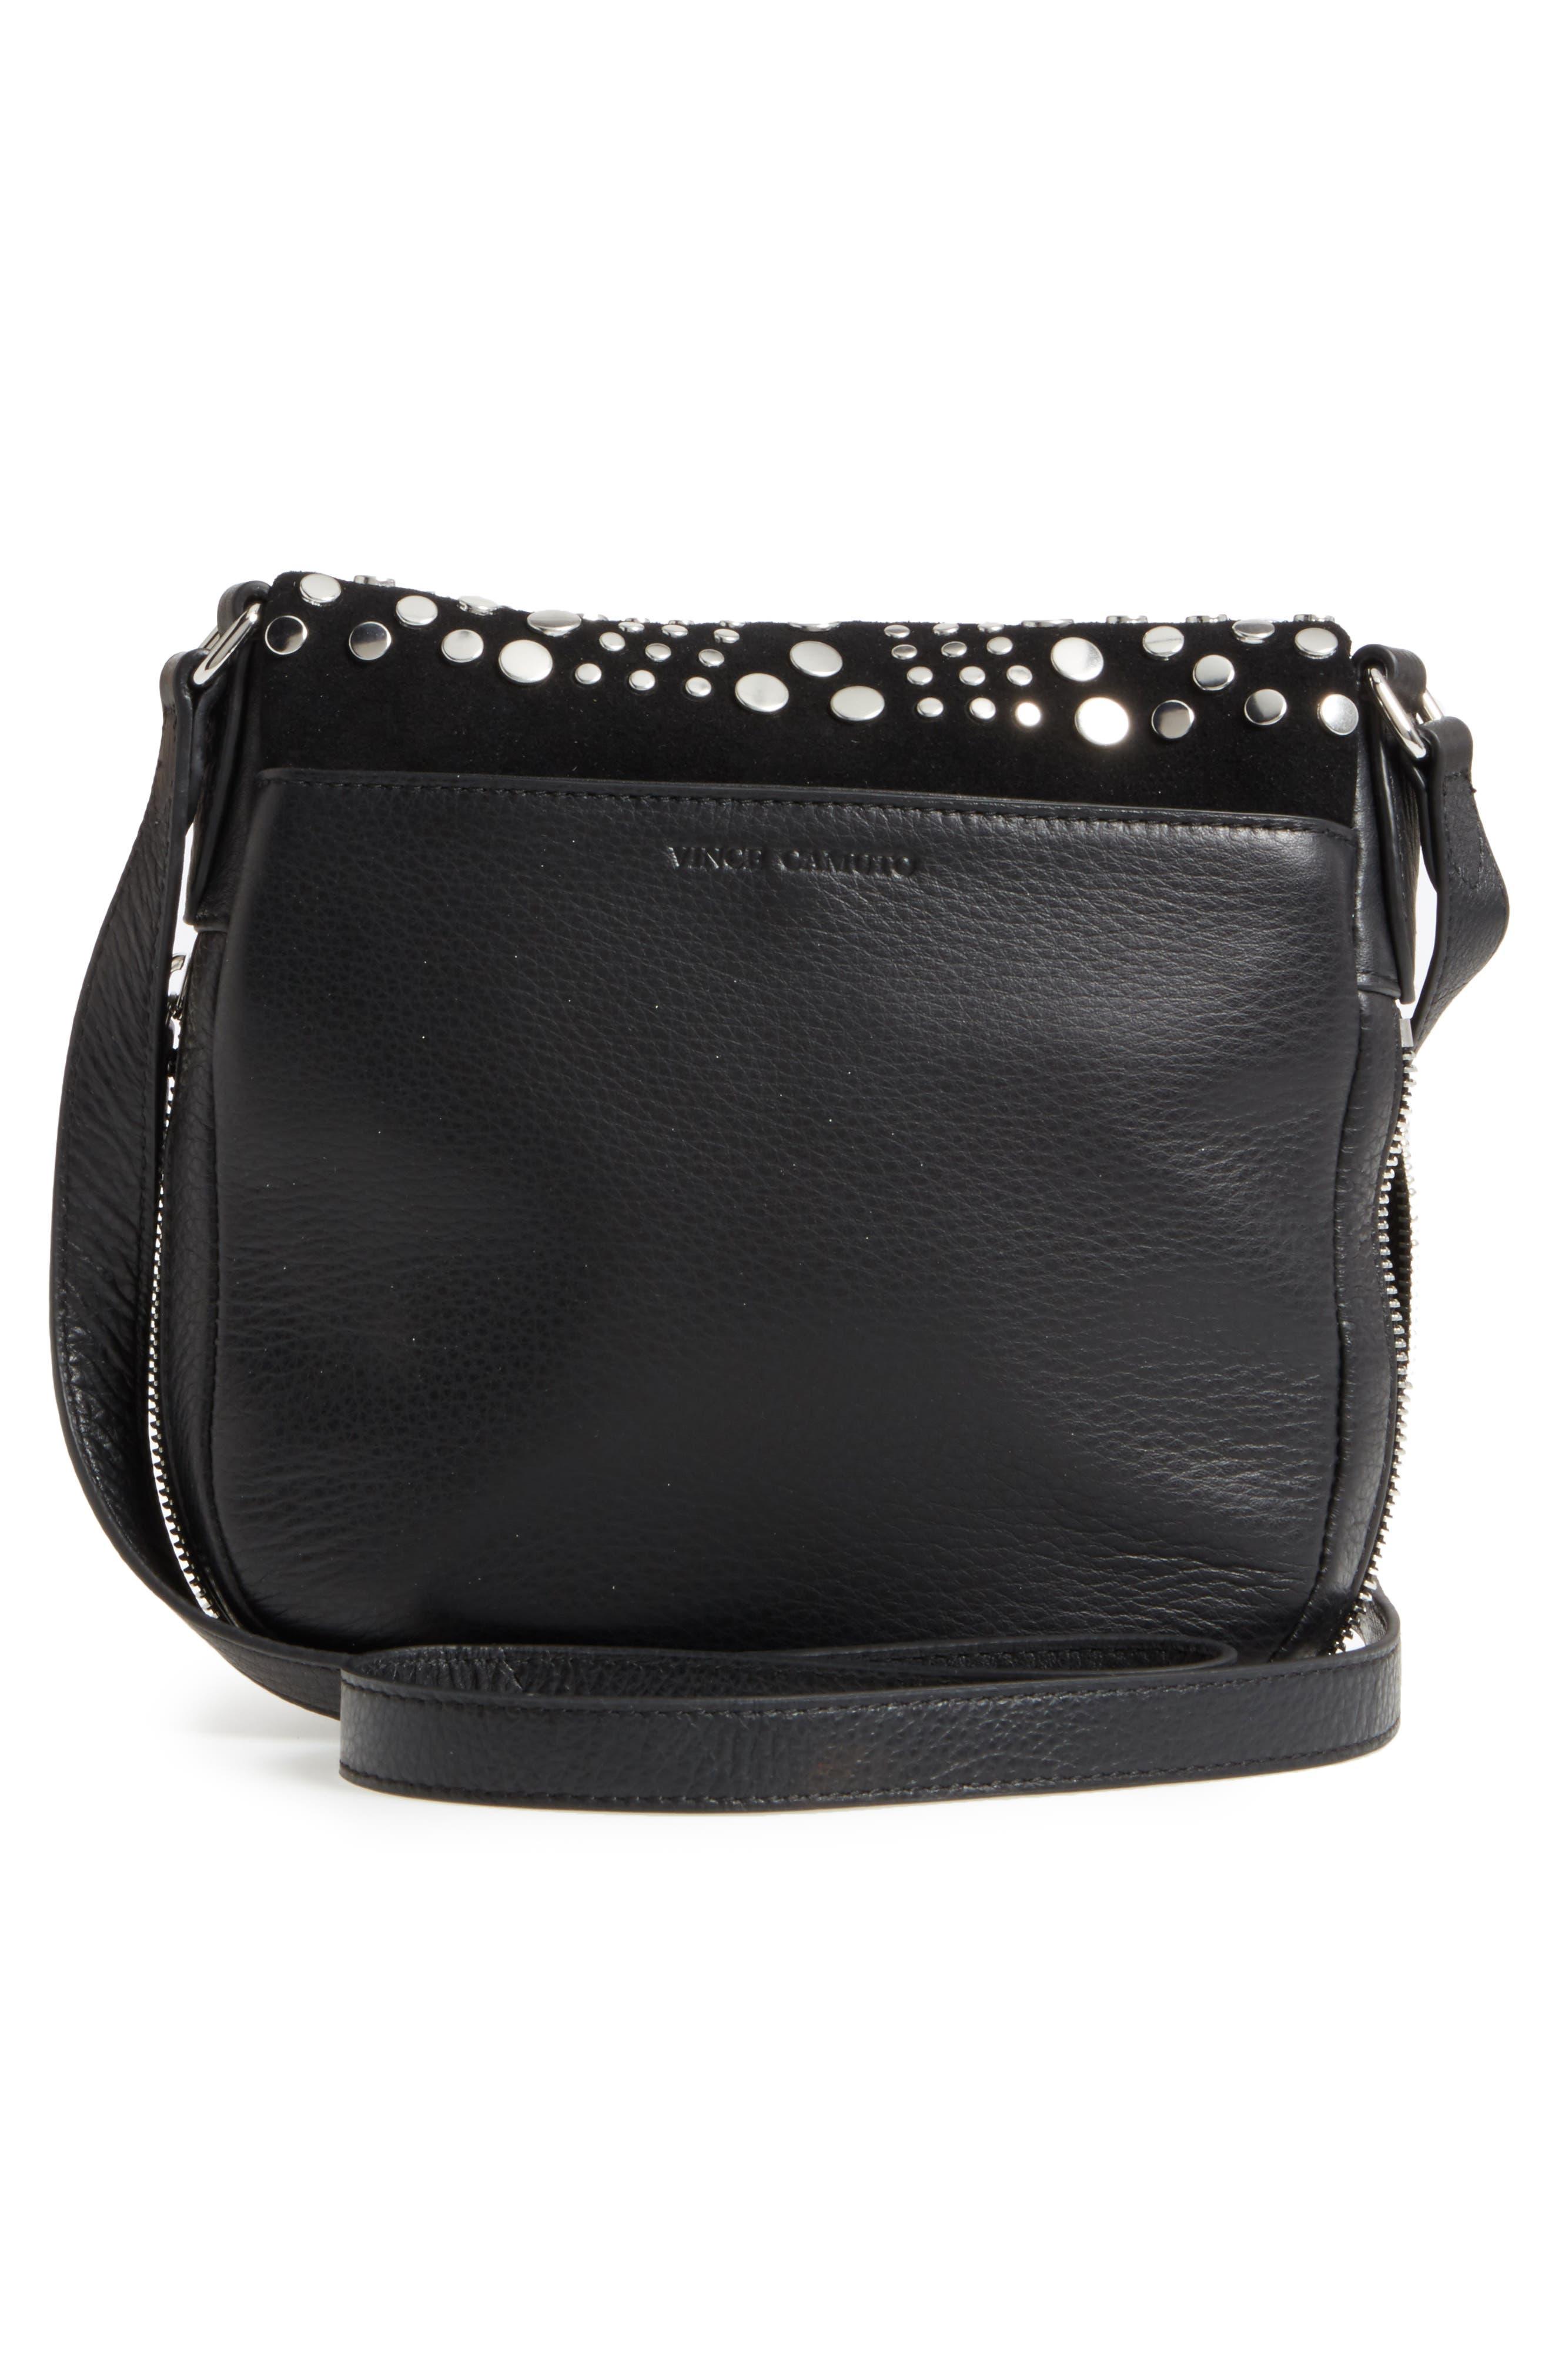 Bonny Studded Leather Crossbody Bag,                             Alternate thumbnail 5, color,